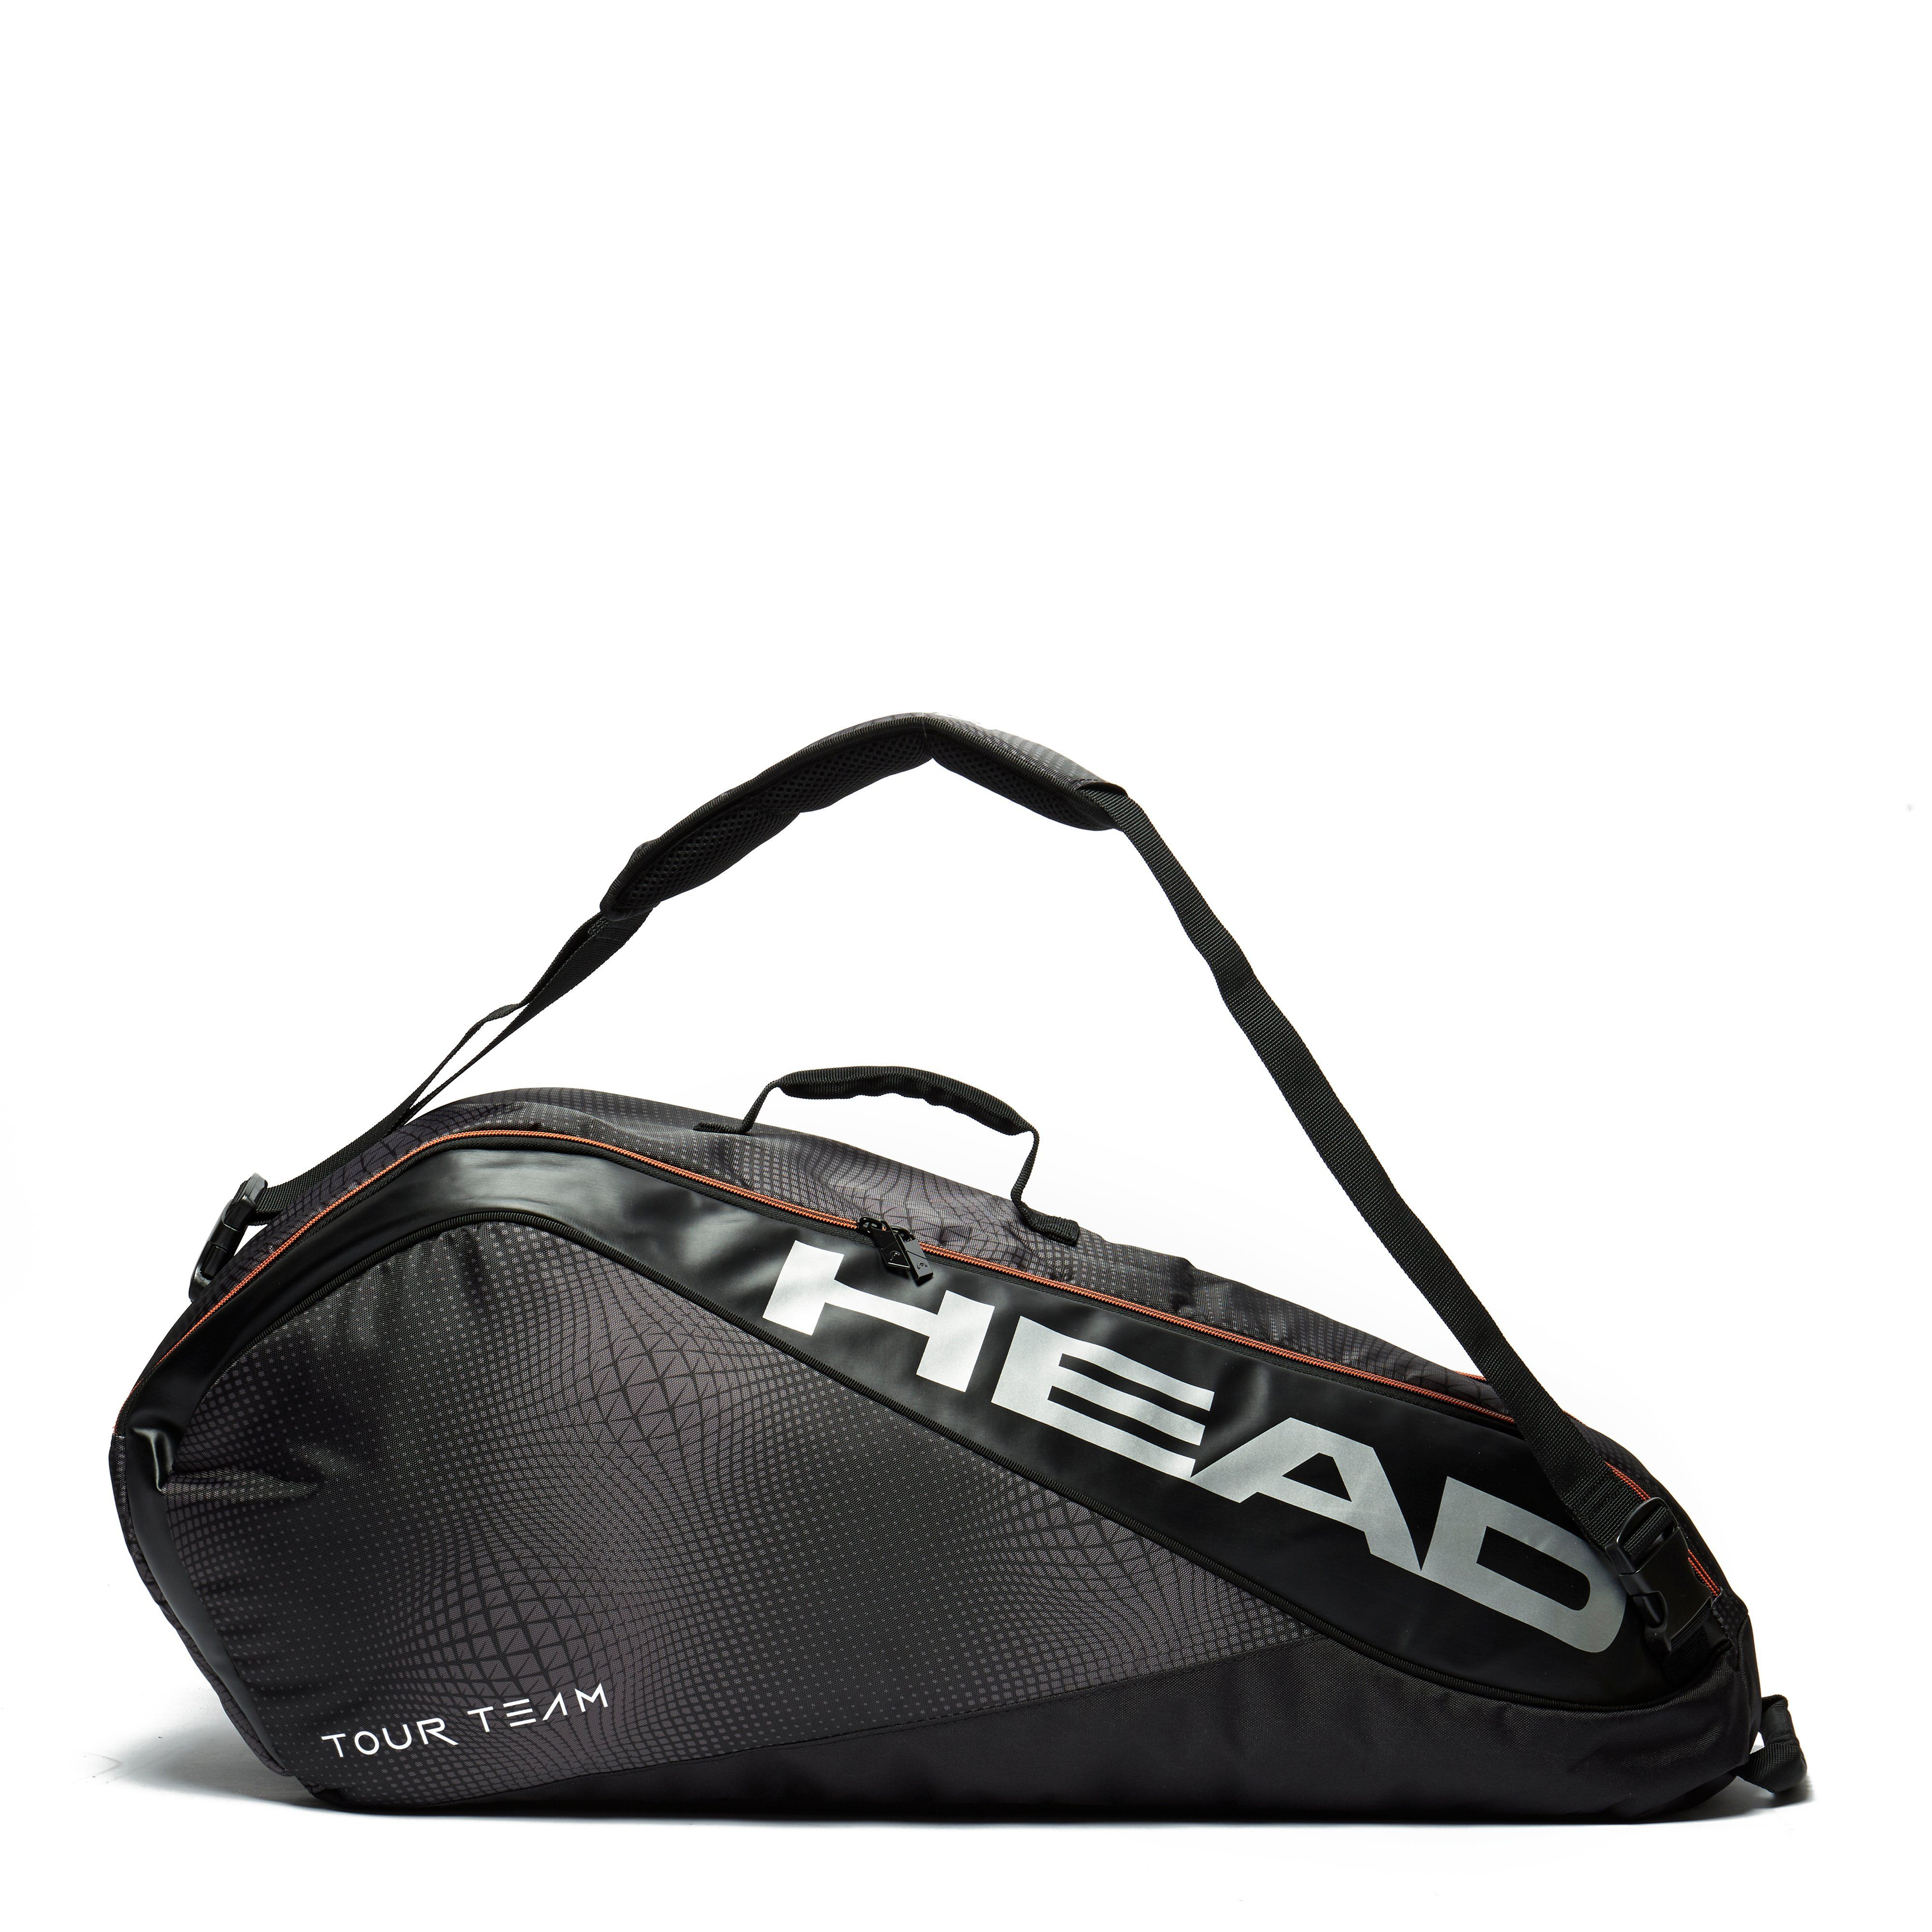 Head Tour Team 6R combi Holdall